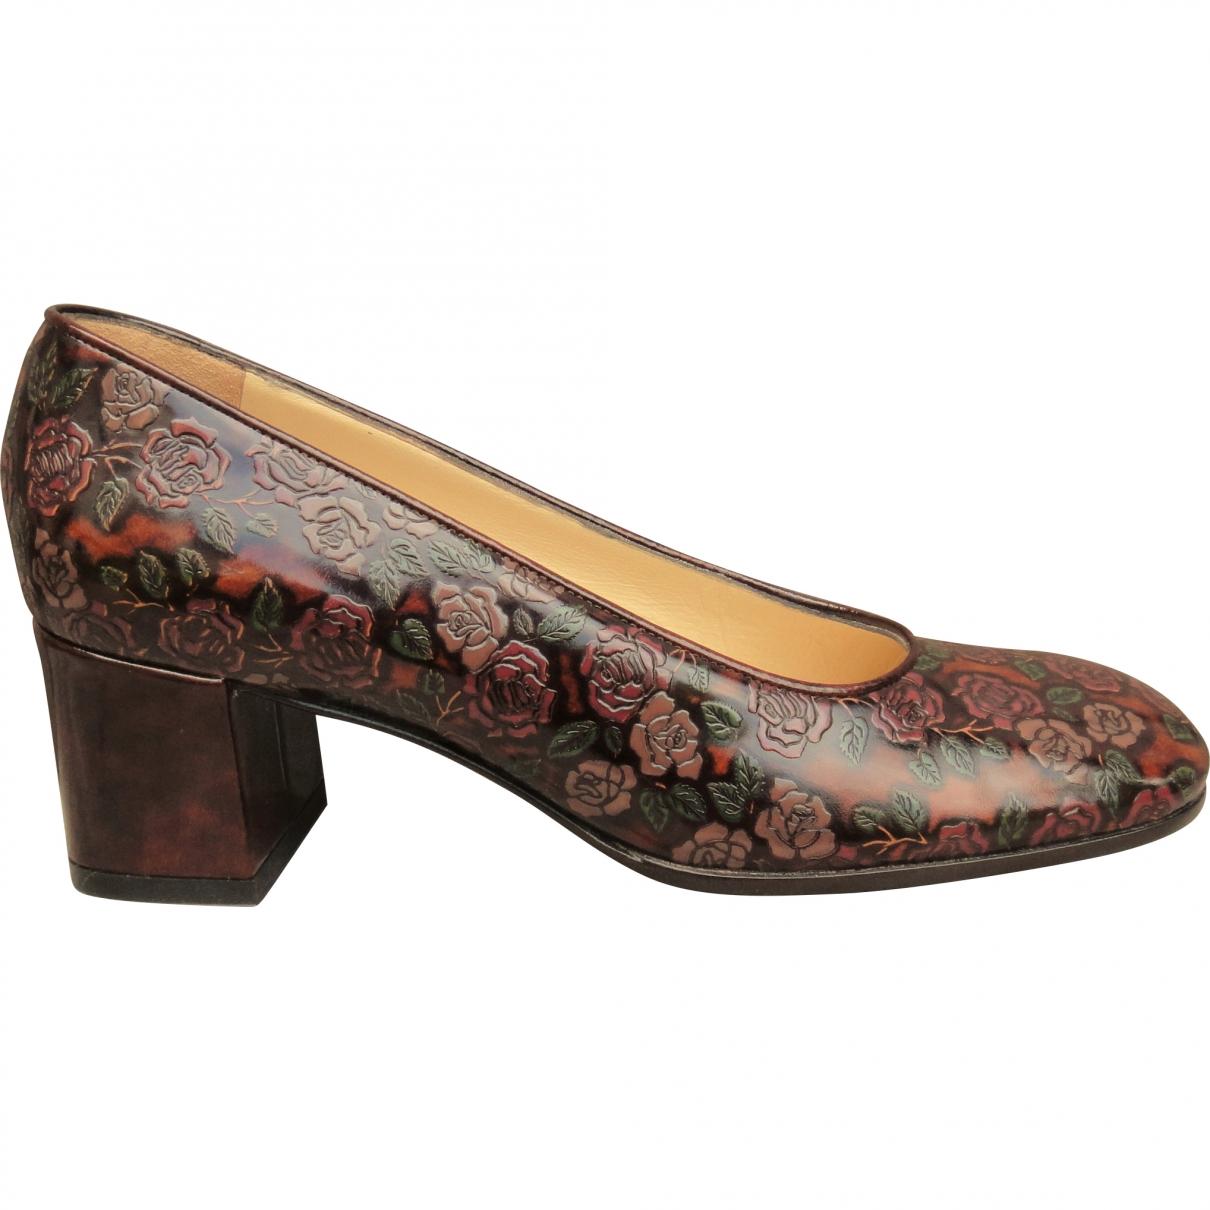 Dolce & Gabbana \N Brown Leather Heels for Women 36.5 EU